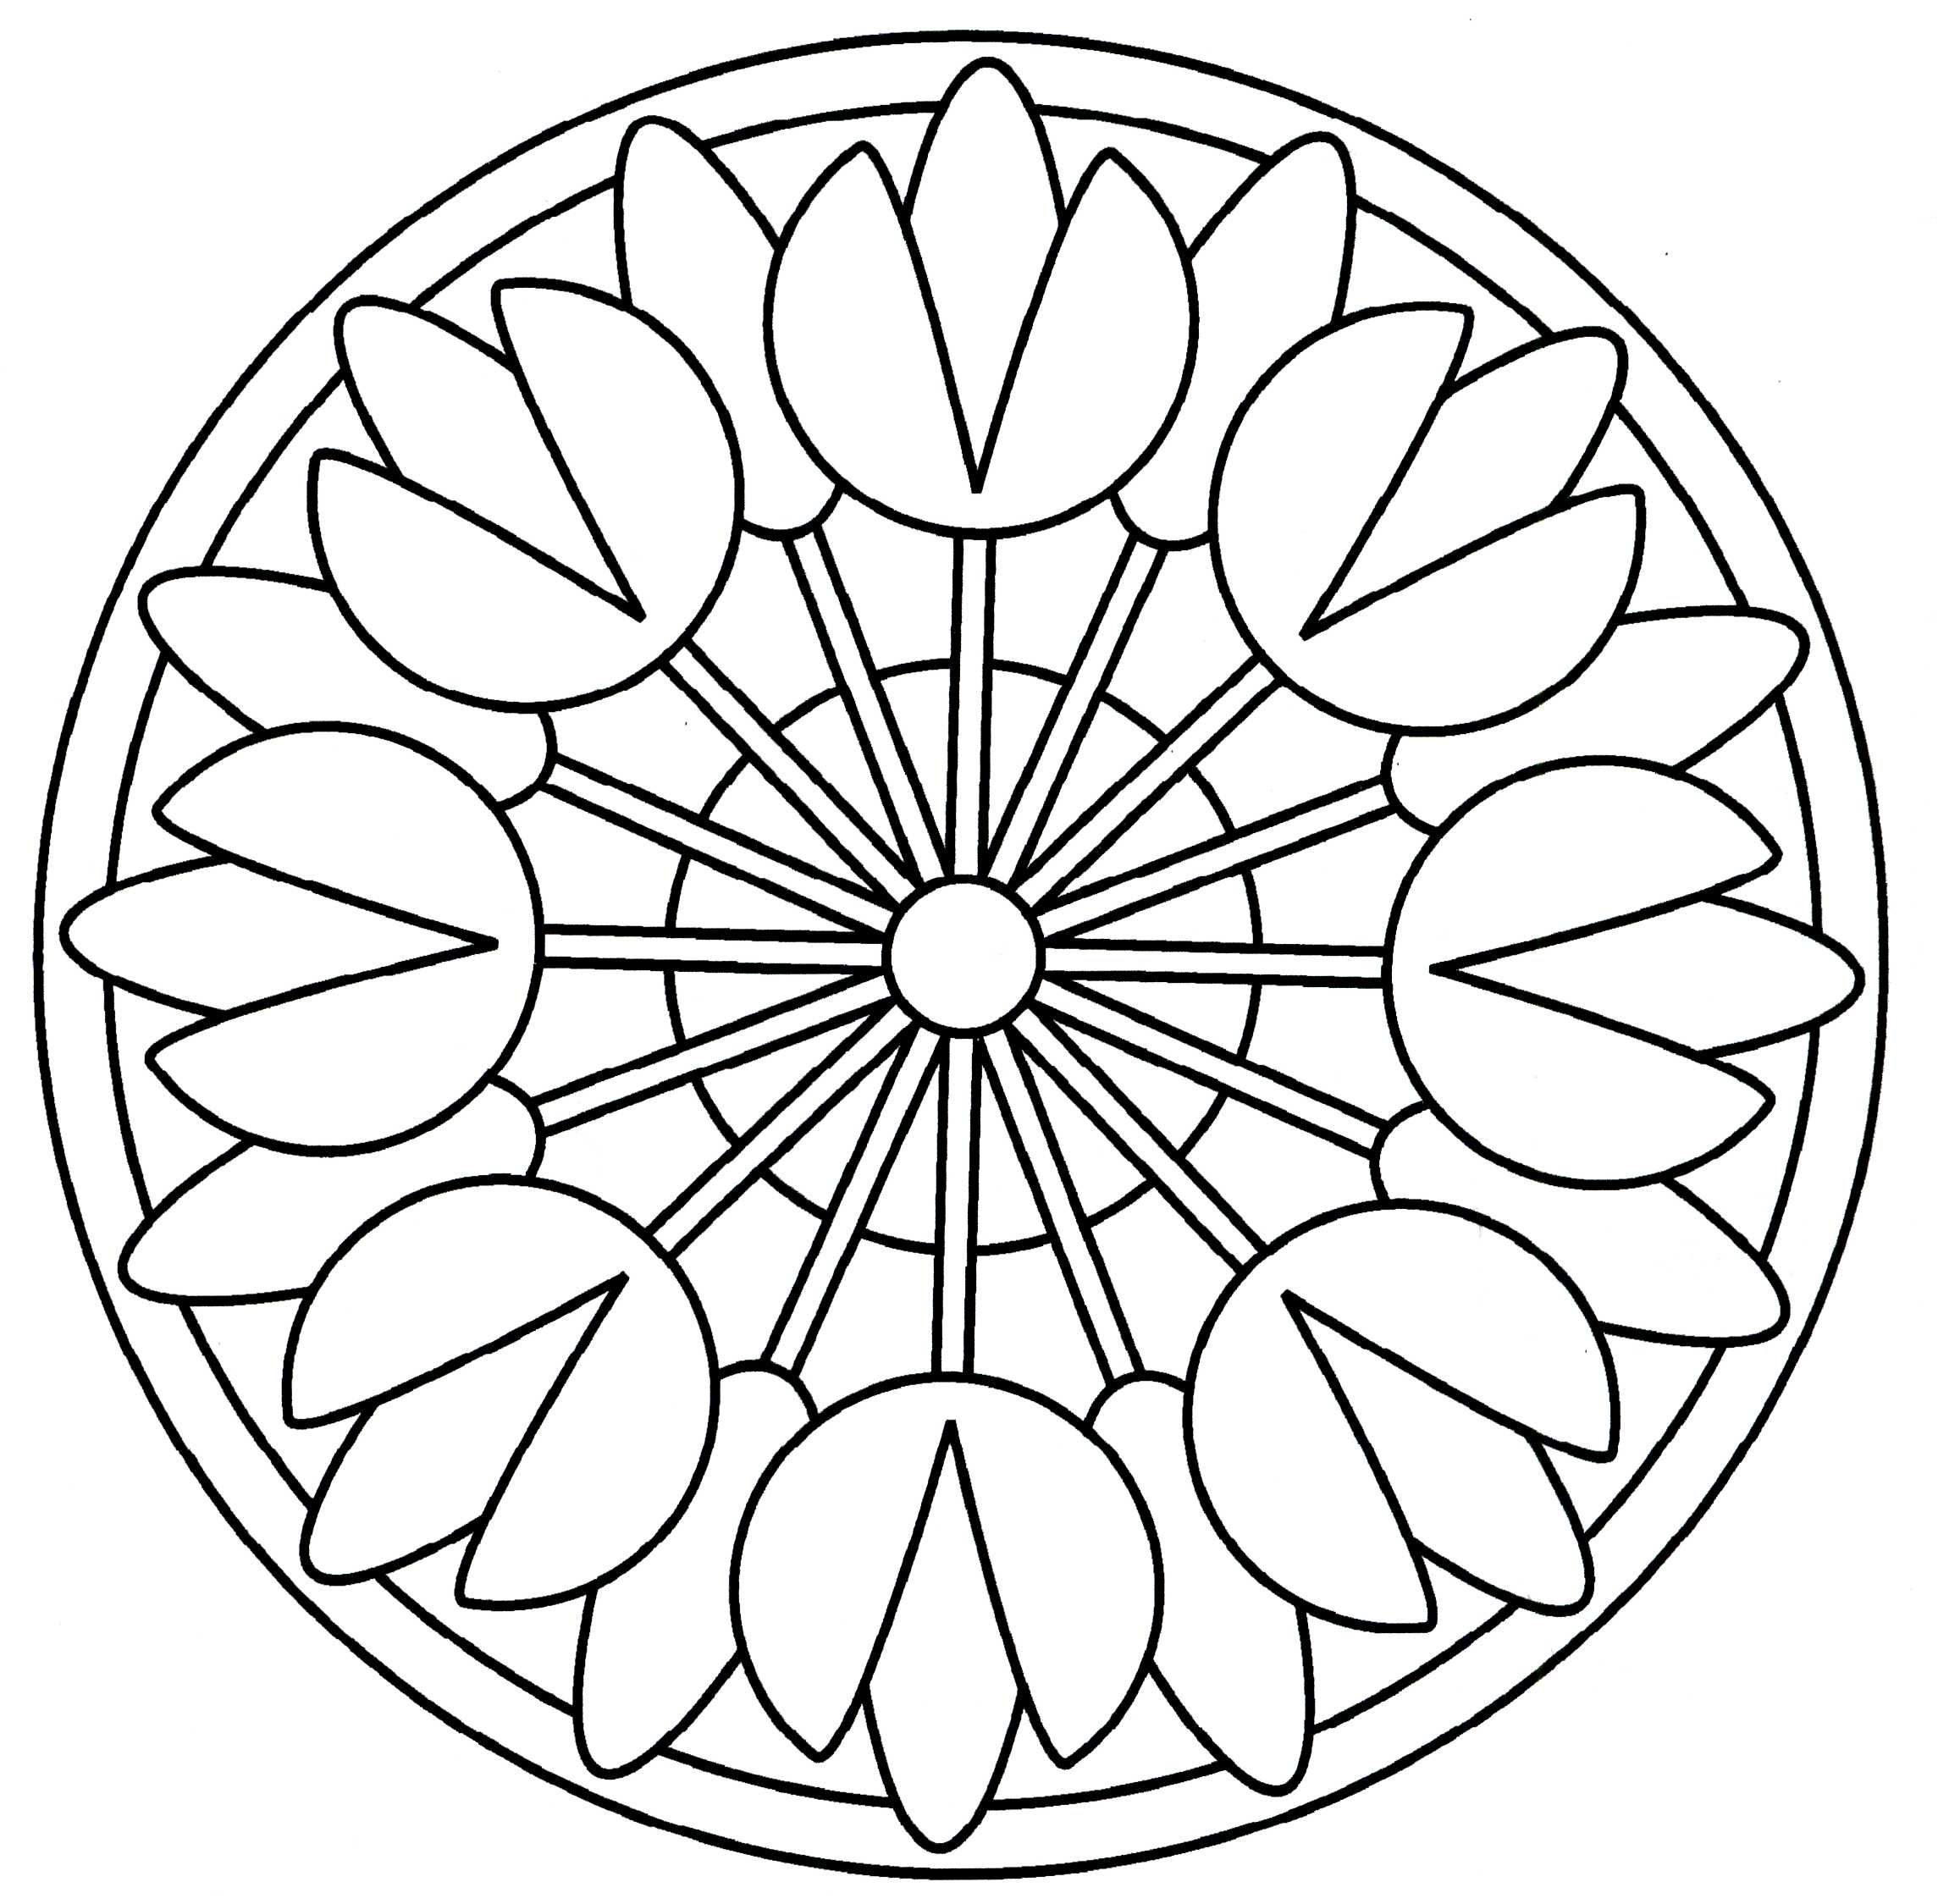 Mandalas de Primavera Hoy os dejamos estas estupendas mandalas